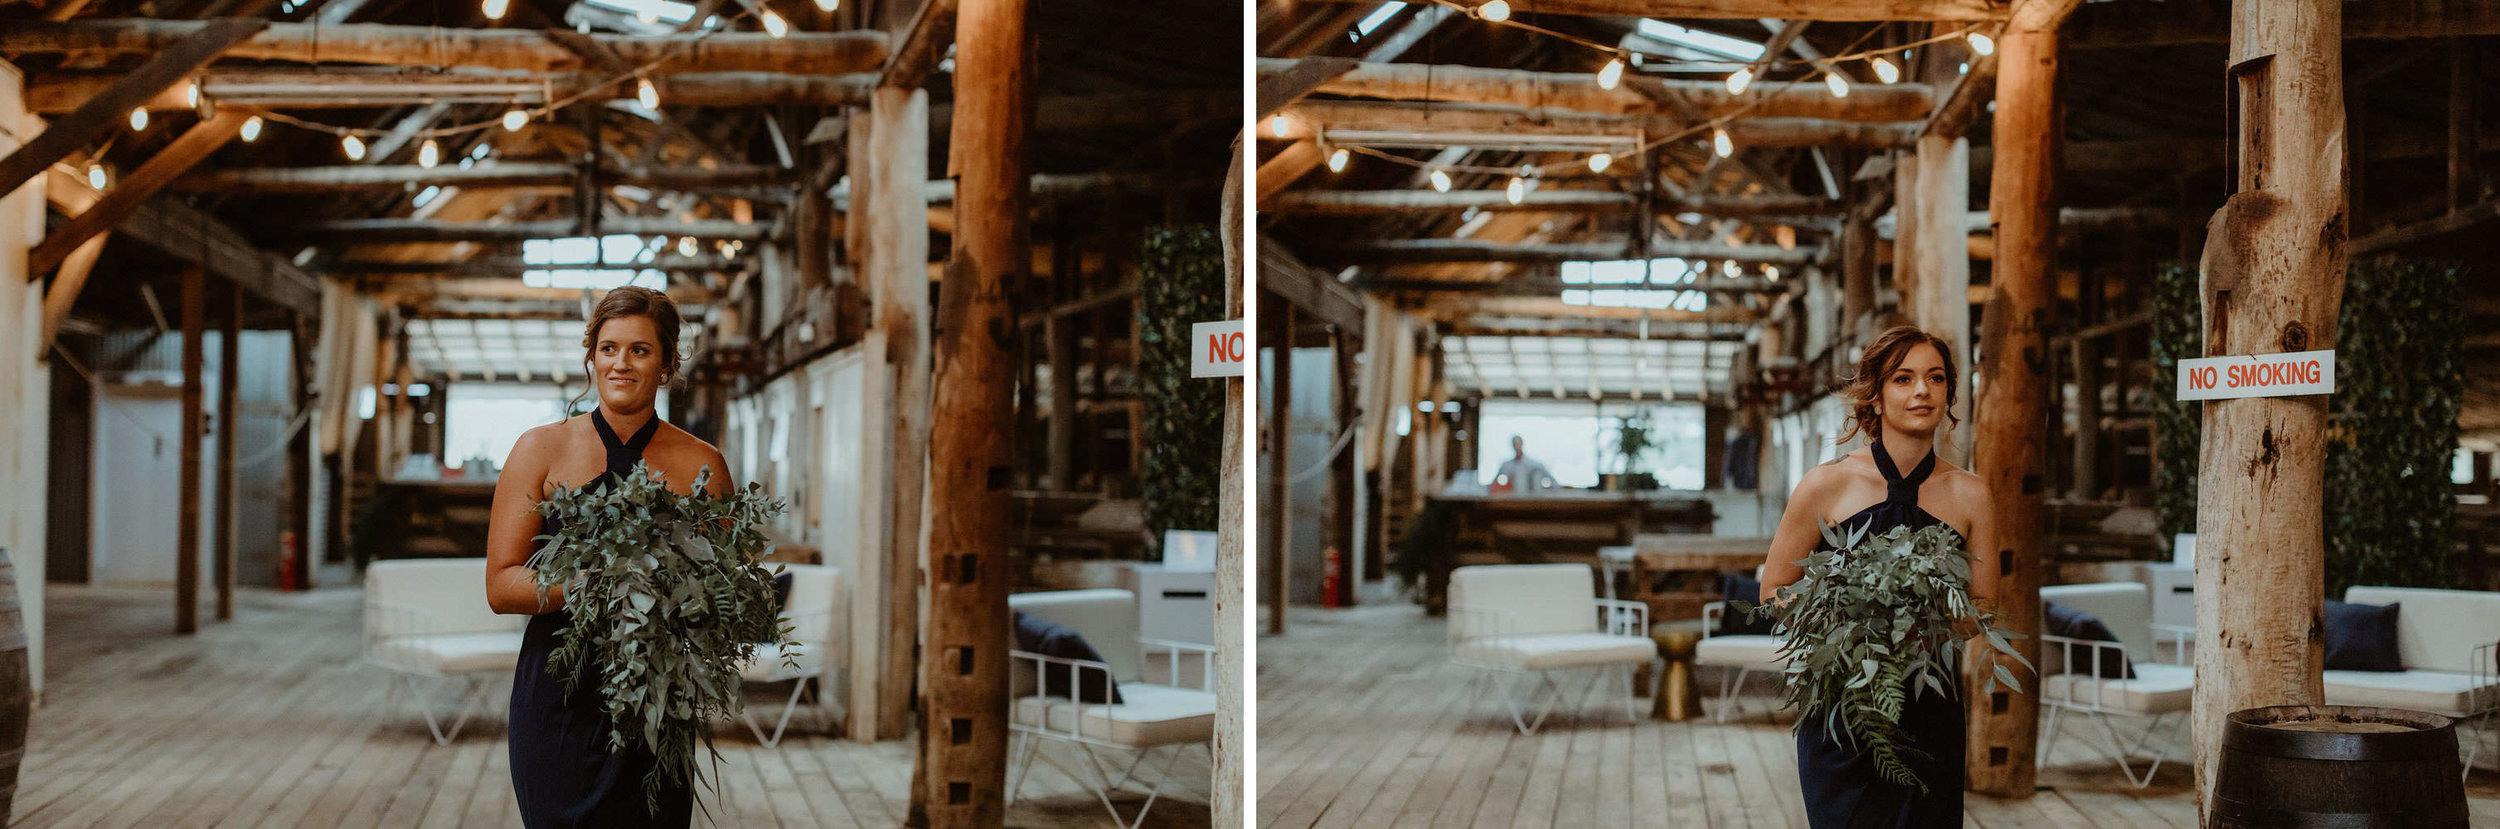 round-hill-homestead-culcairn-wedding-40.jpg